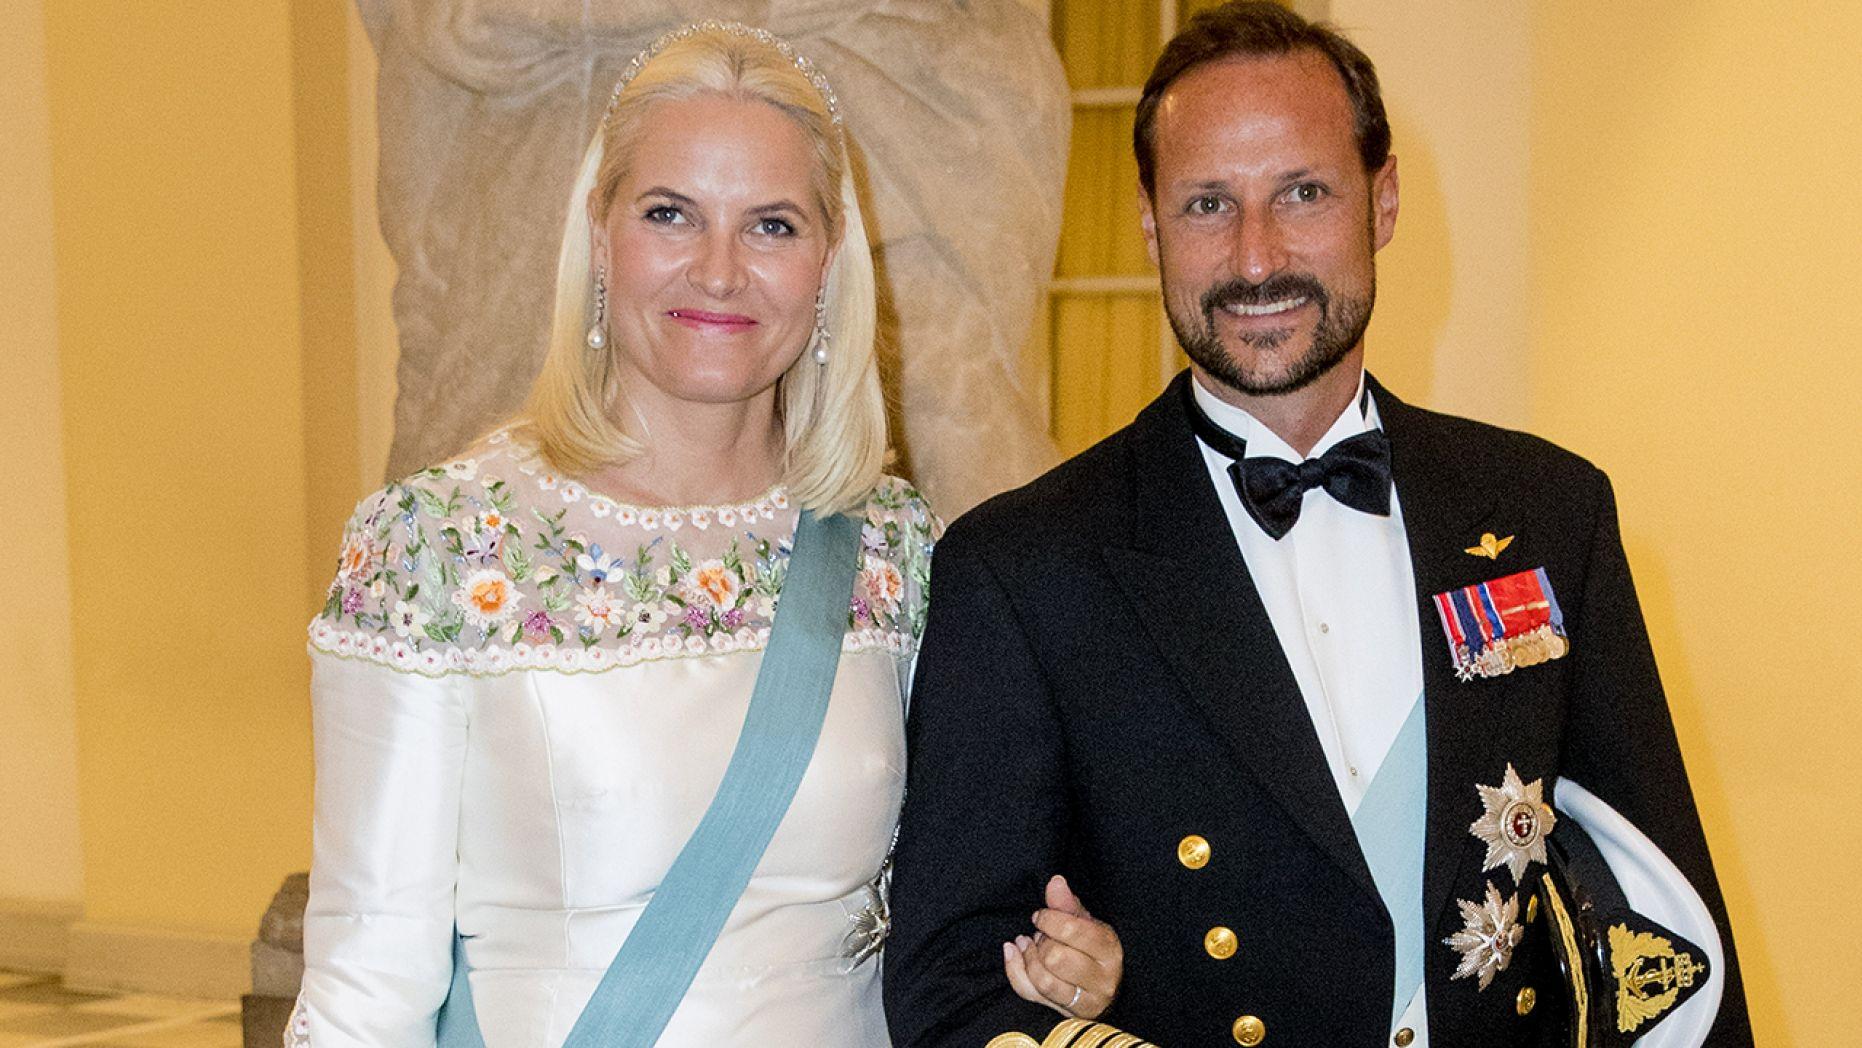 Norway's Crown Princess Mette-Marit reveals rare lung disease